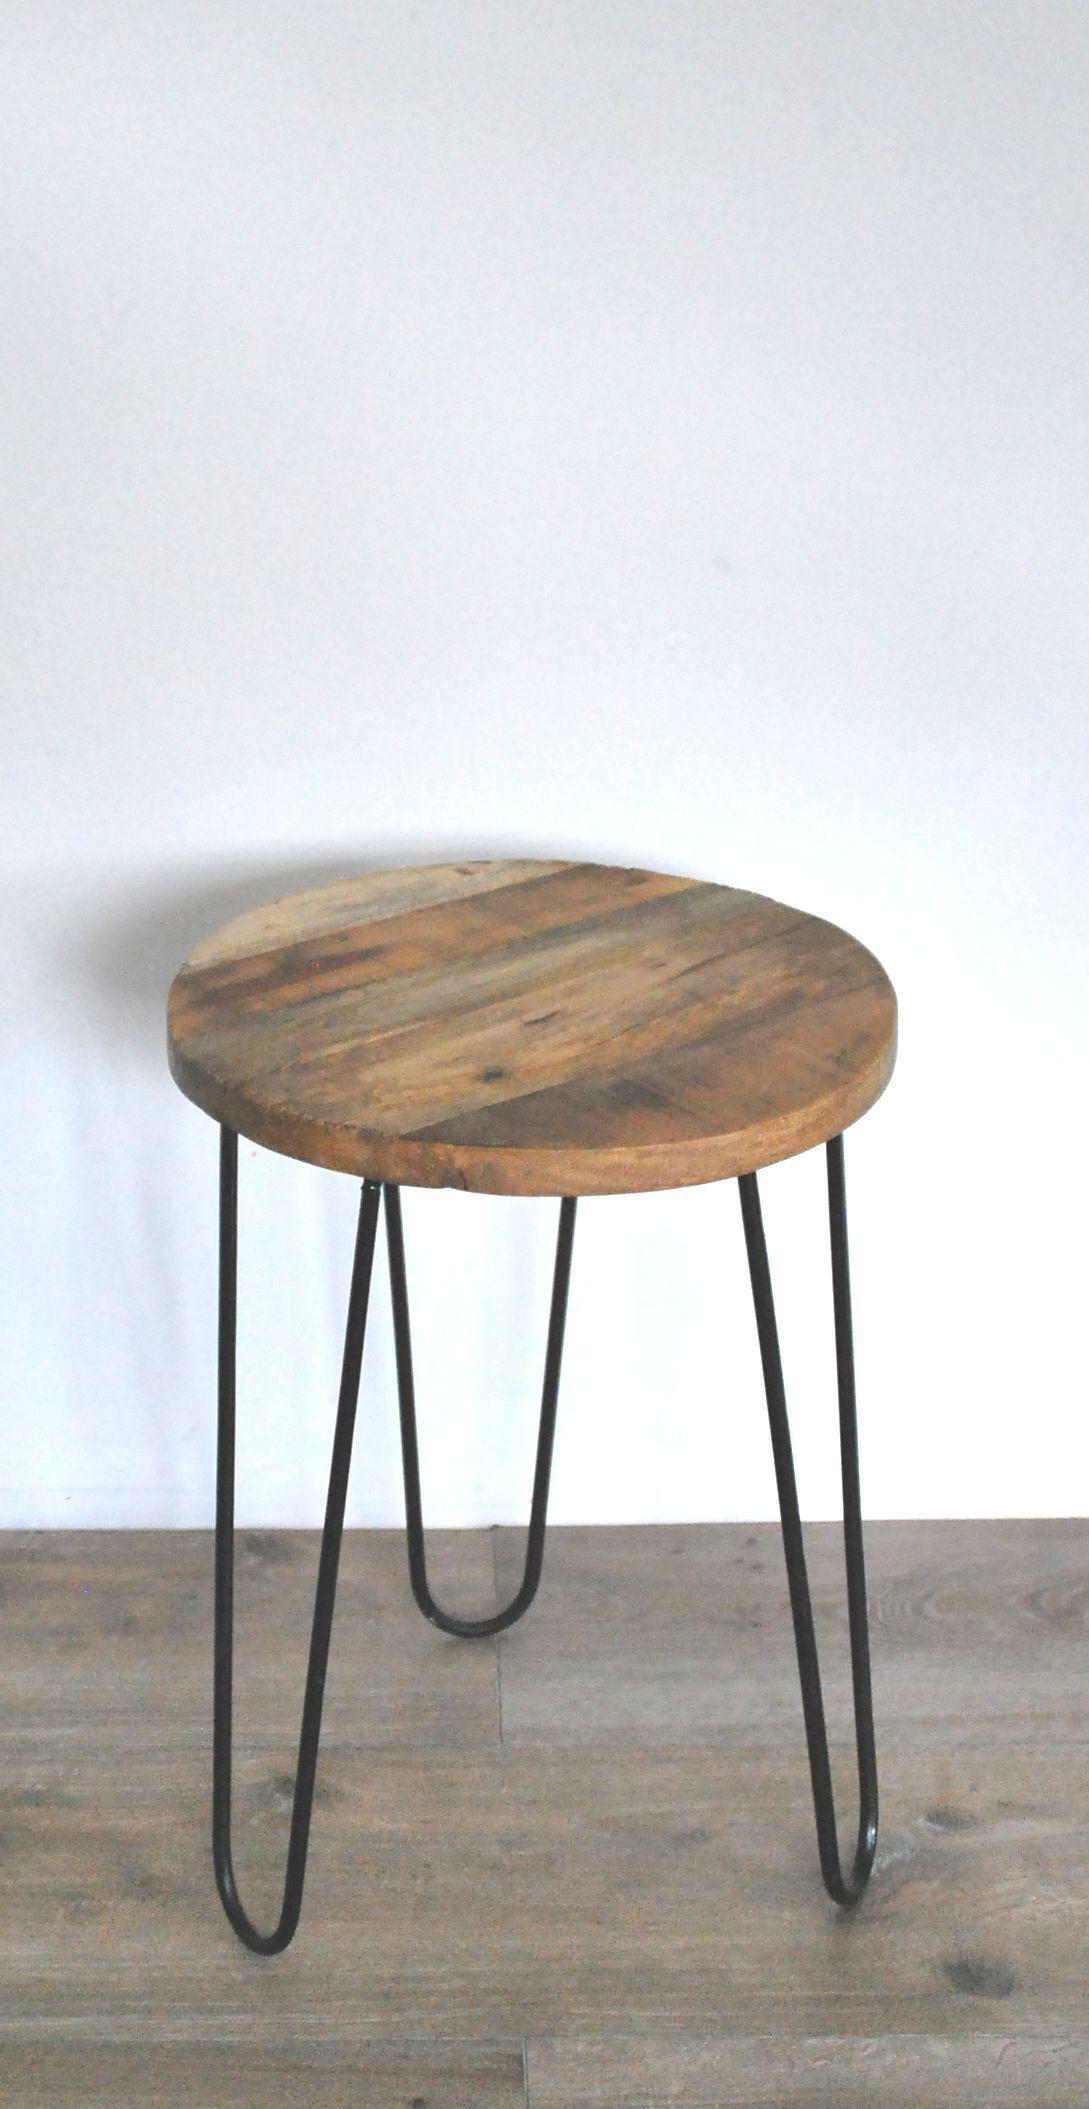 Bijzettafel Houten Blad.Bijzettafel Iron Woonideeen Home Decor Furniture En Interior